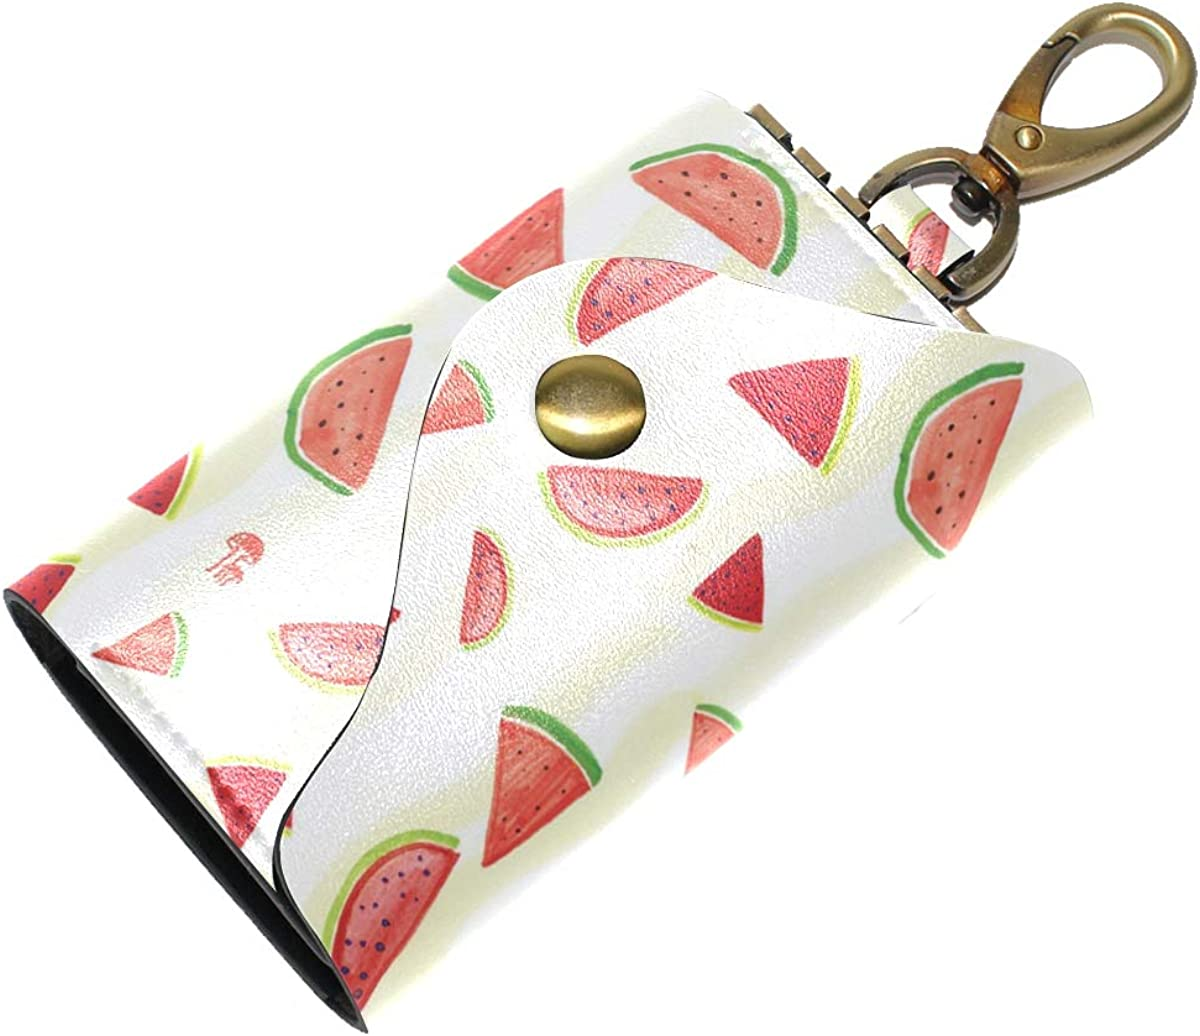 KEAKIA Watermelon Pattern Leather Key Case Wallets Tri-fold Key Holder Keychains with 6 Hooks 2 Slot Snap Closure for Men Women